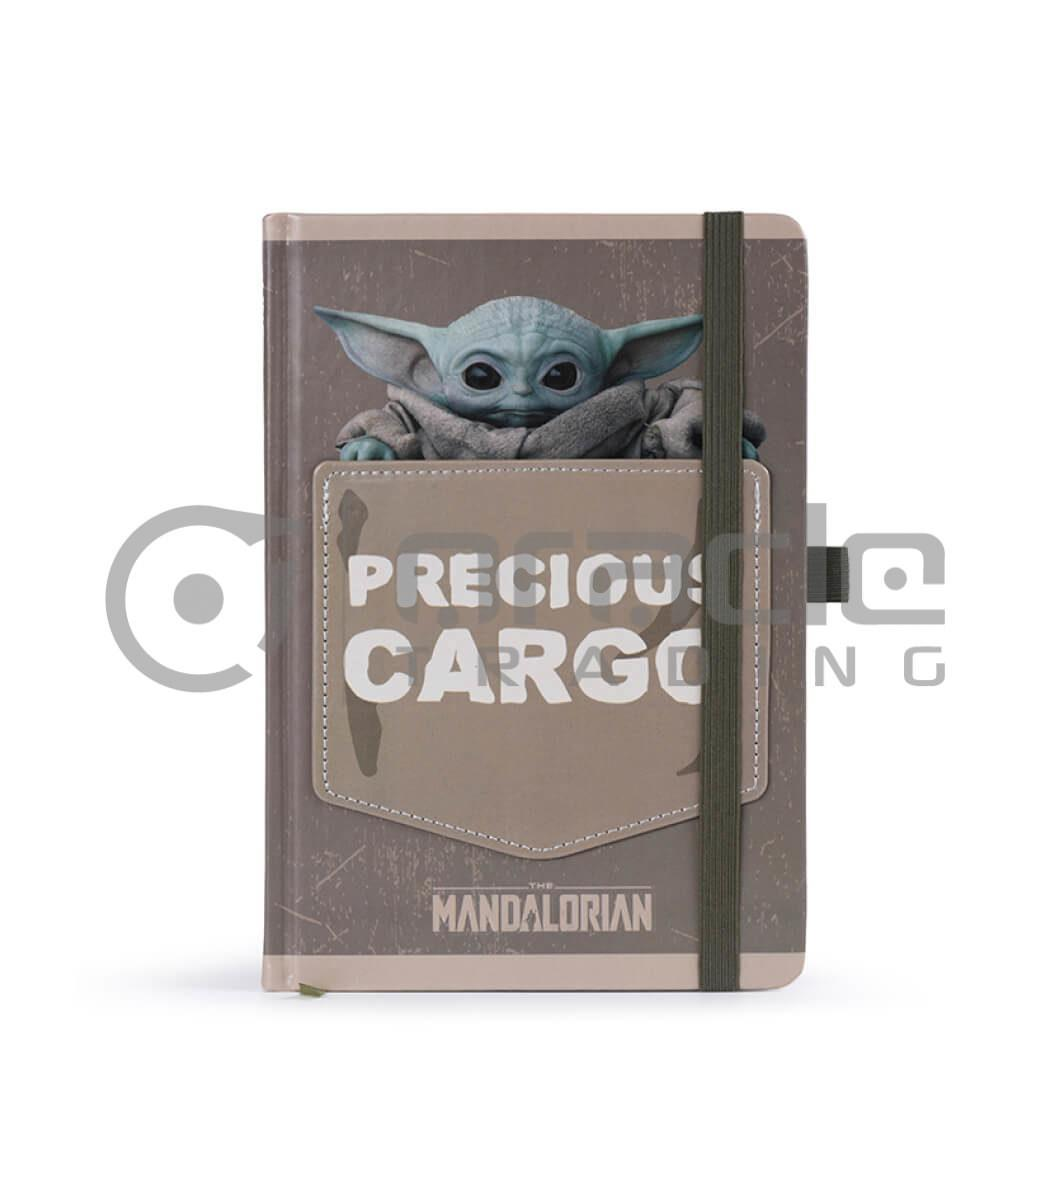 Star Wars: The Mandalorian Notebook - Precious Cargo (Premium)